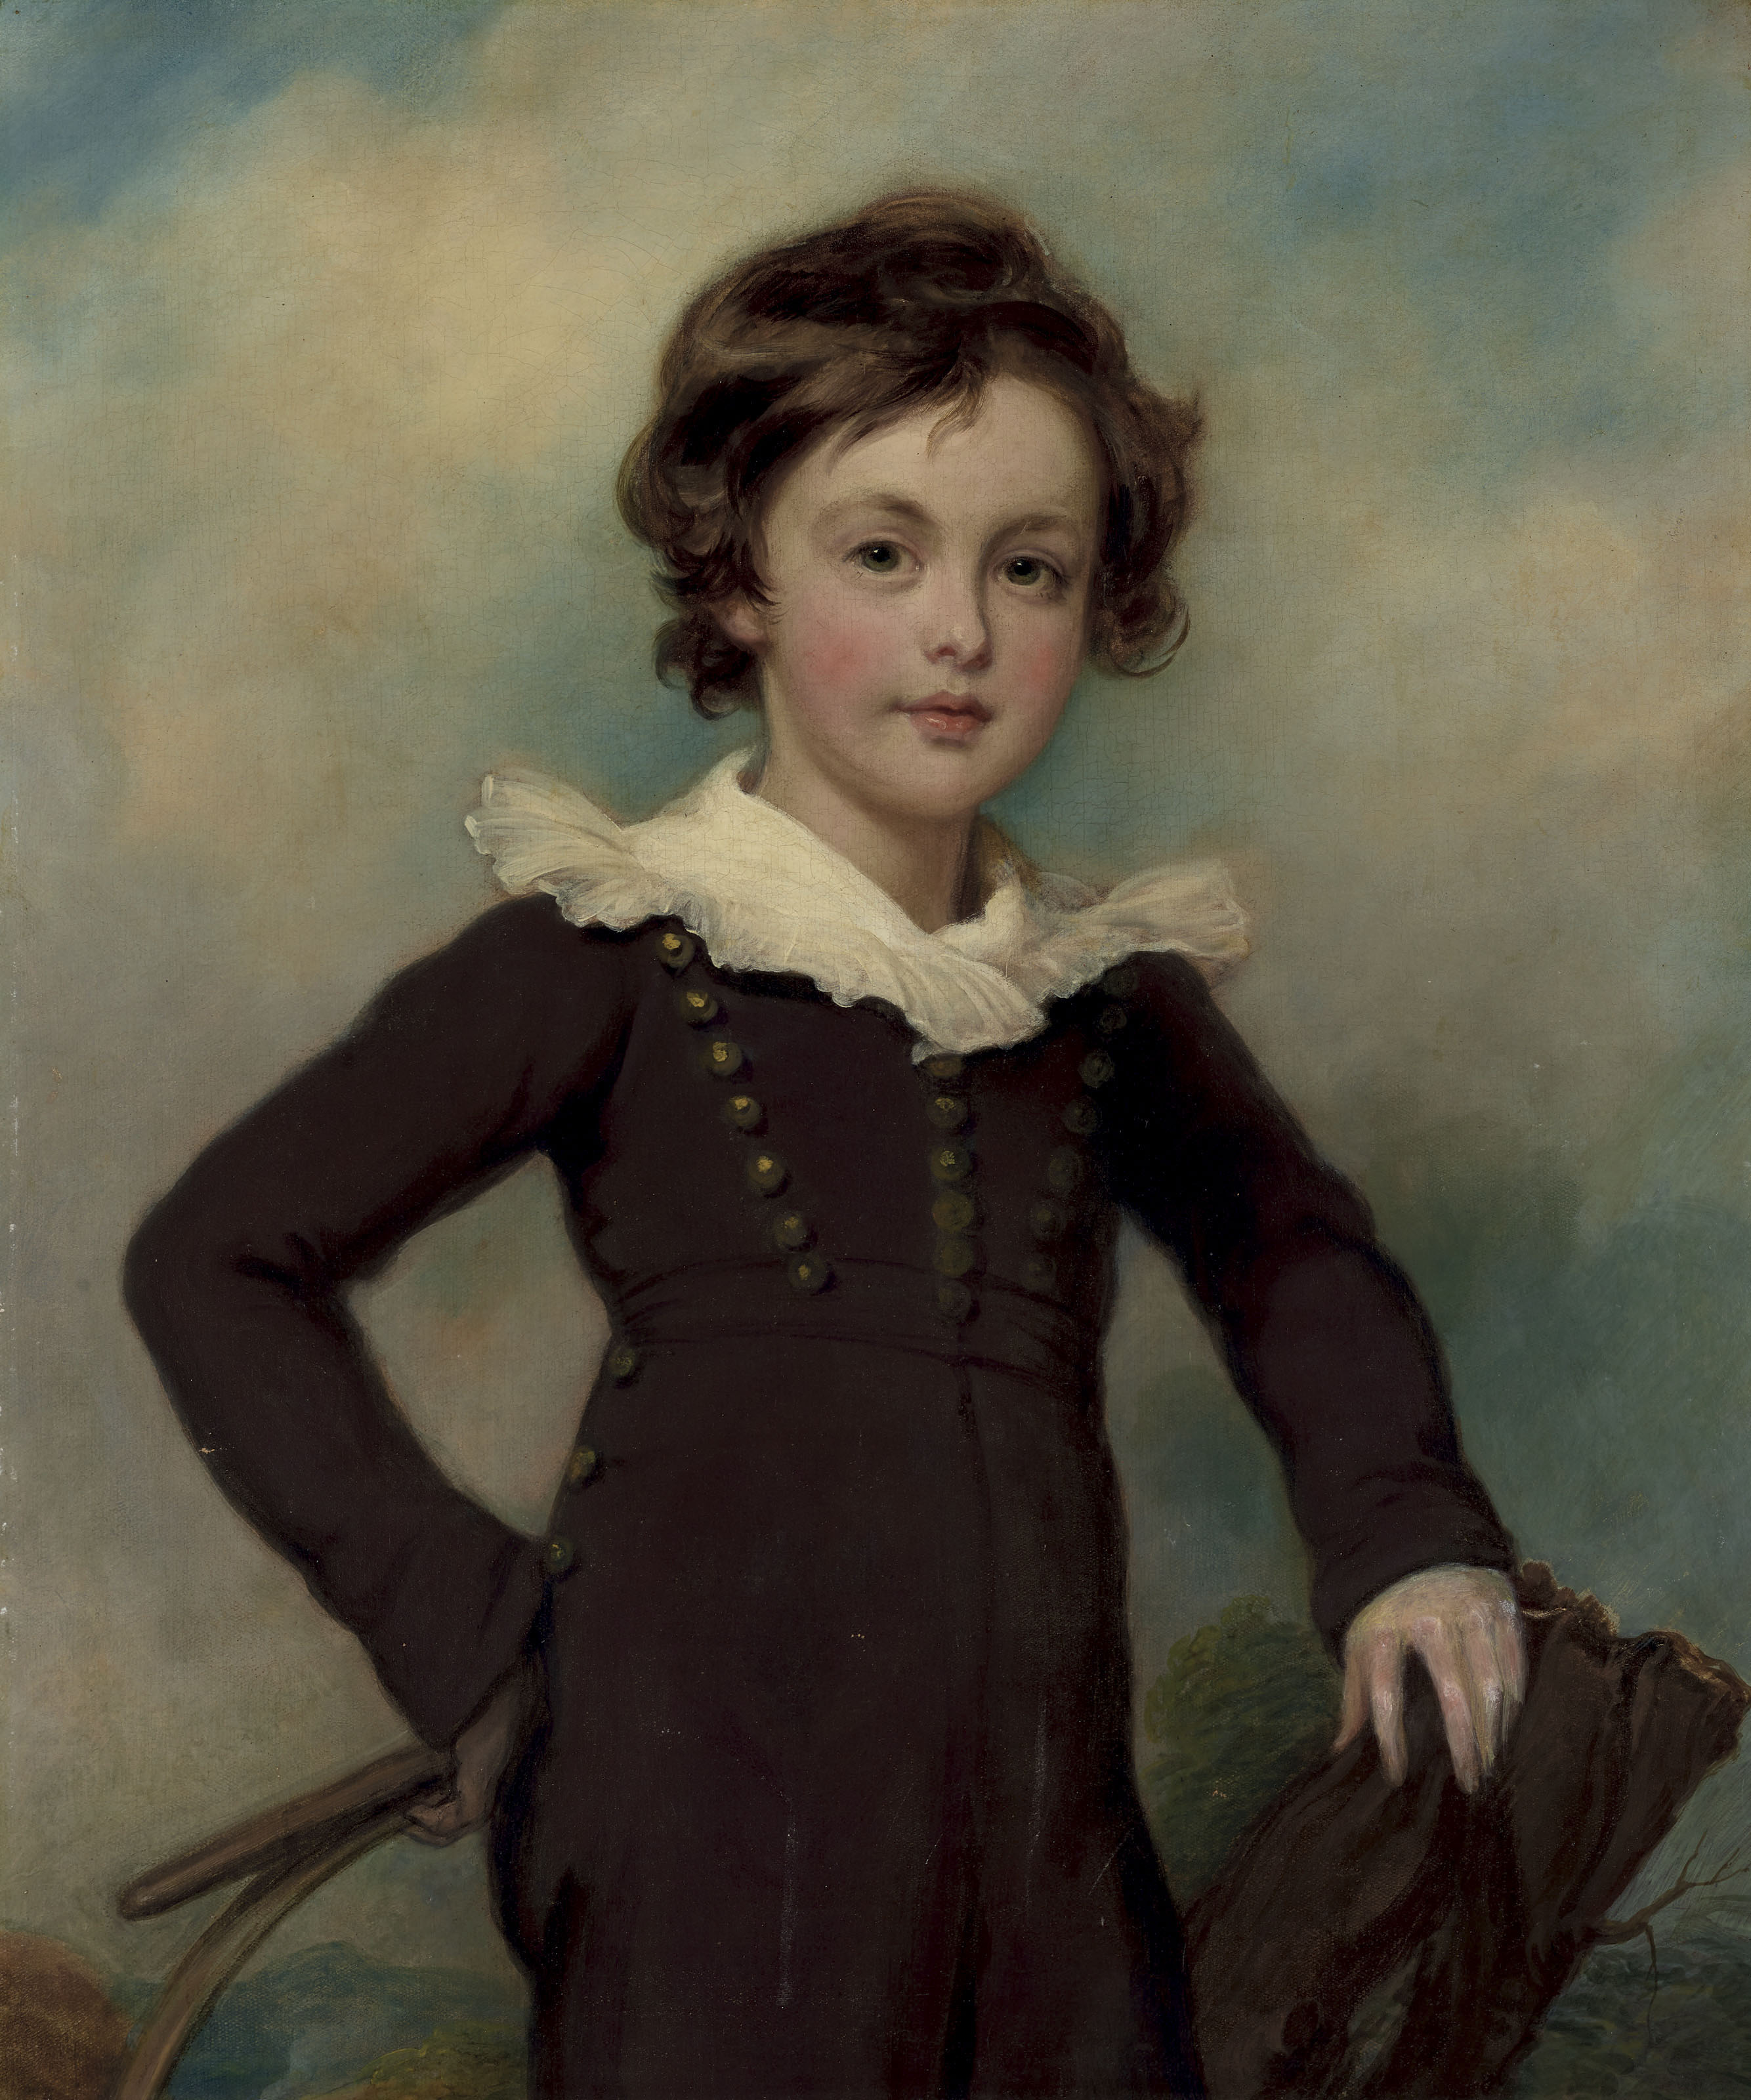 Portrait of Martin Farquhar Tupper (1810-1889), half-length